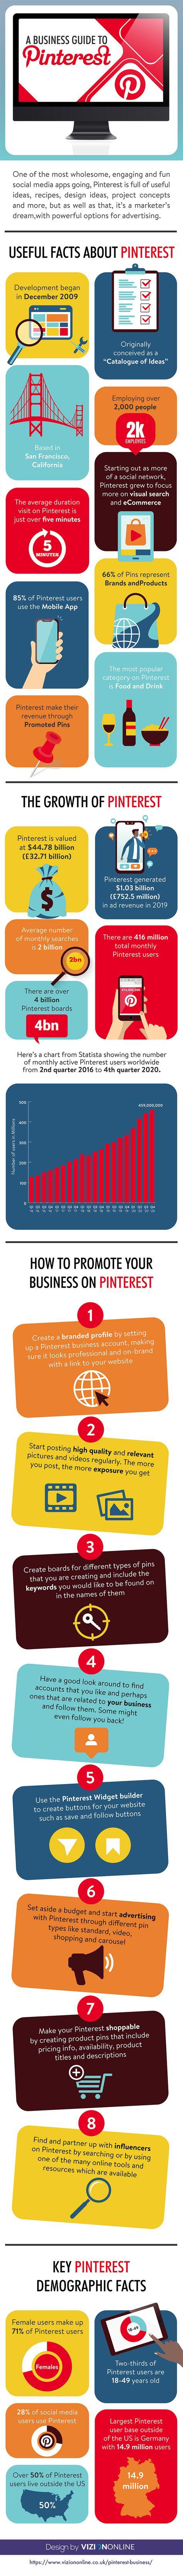 8 Pinterest Marketing Strategies to Generate Website Traffic & Online Sales